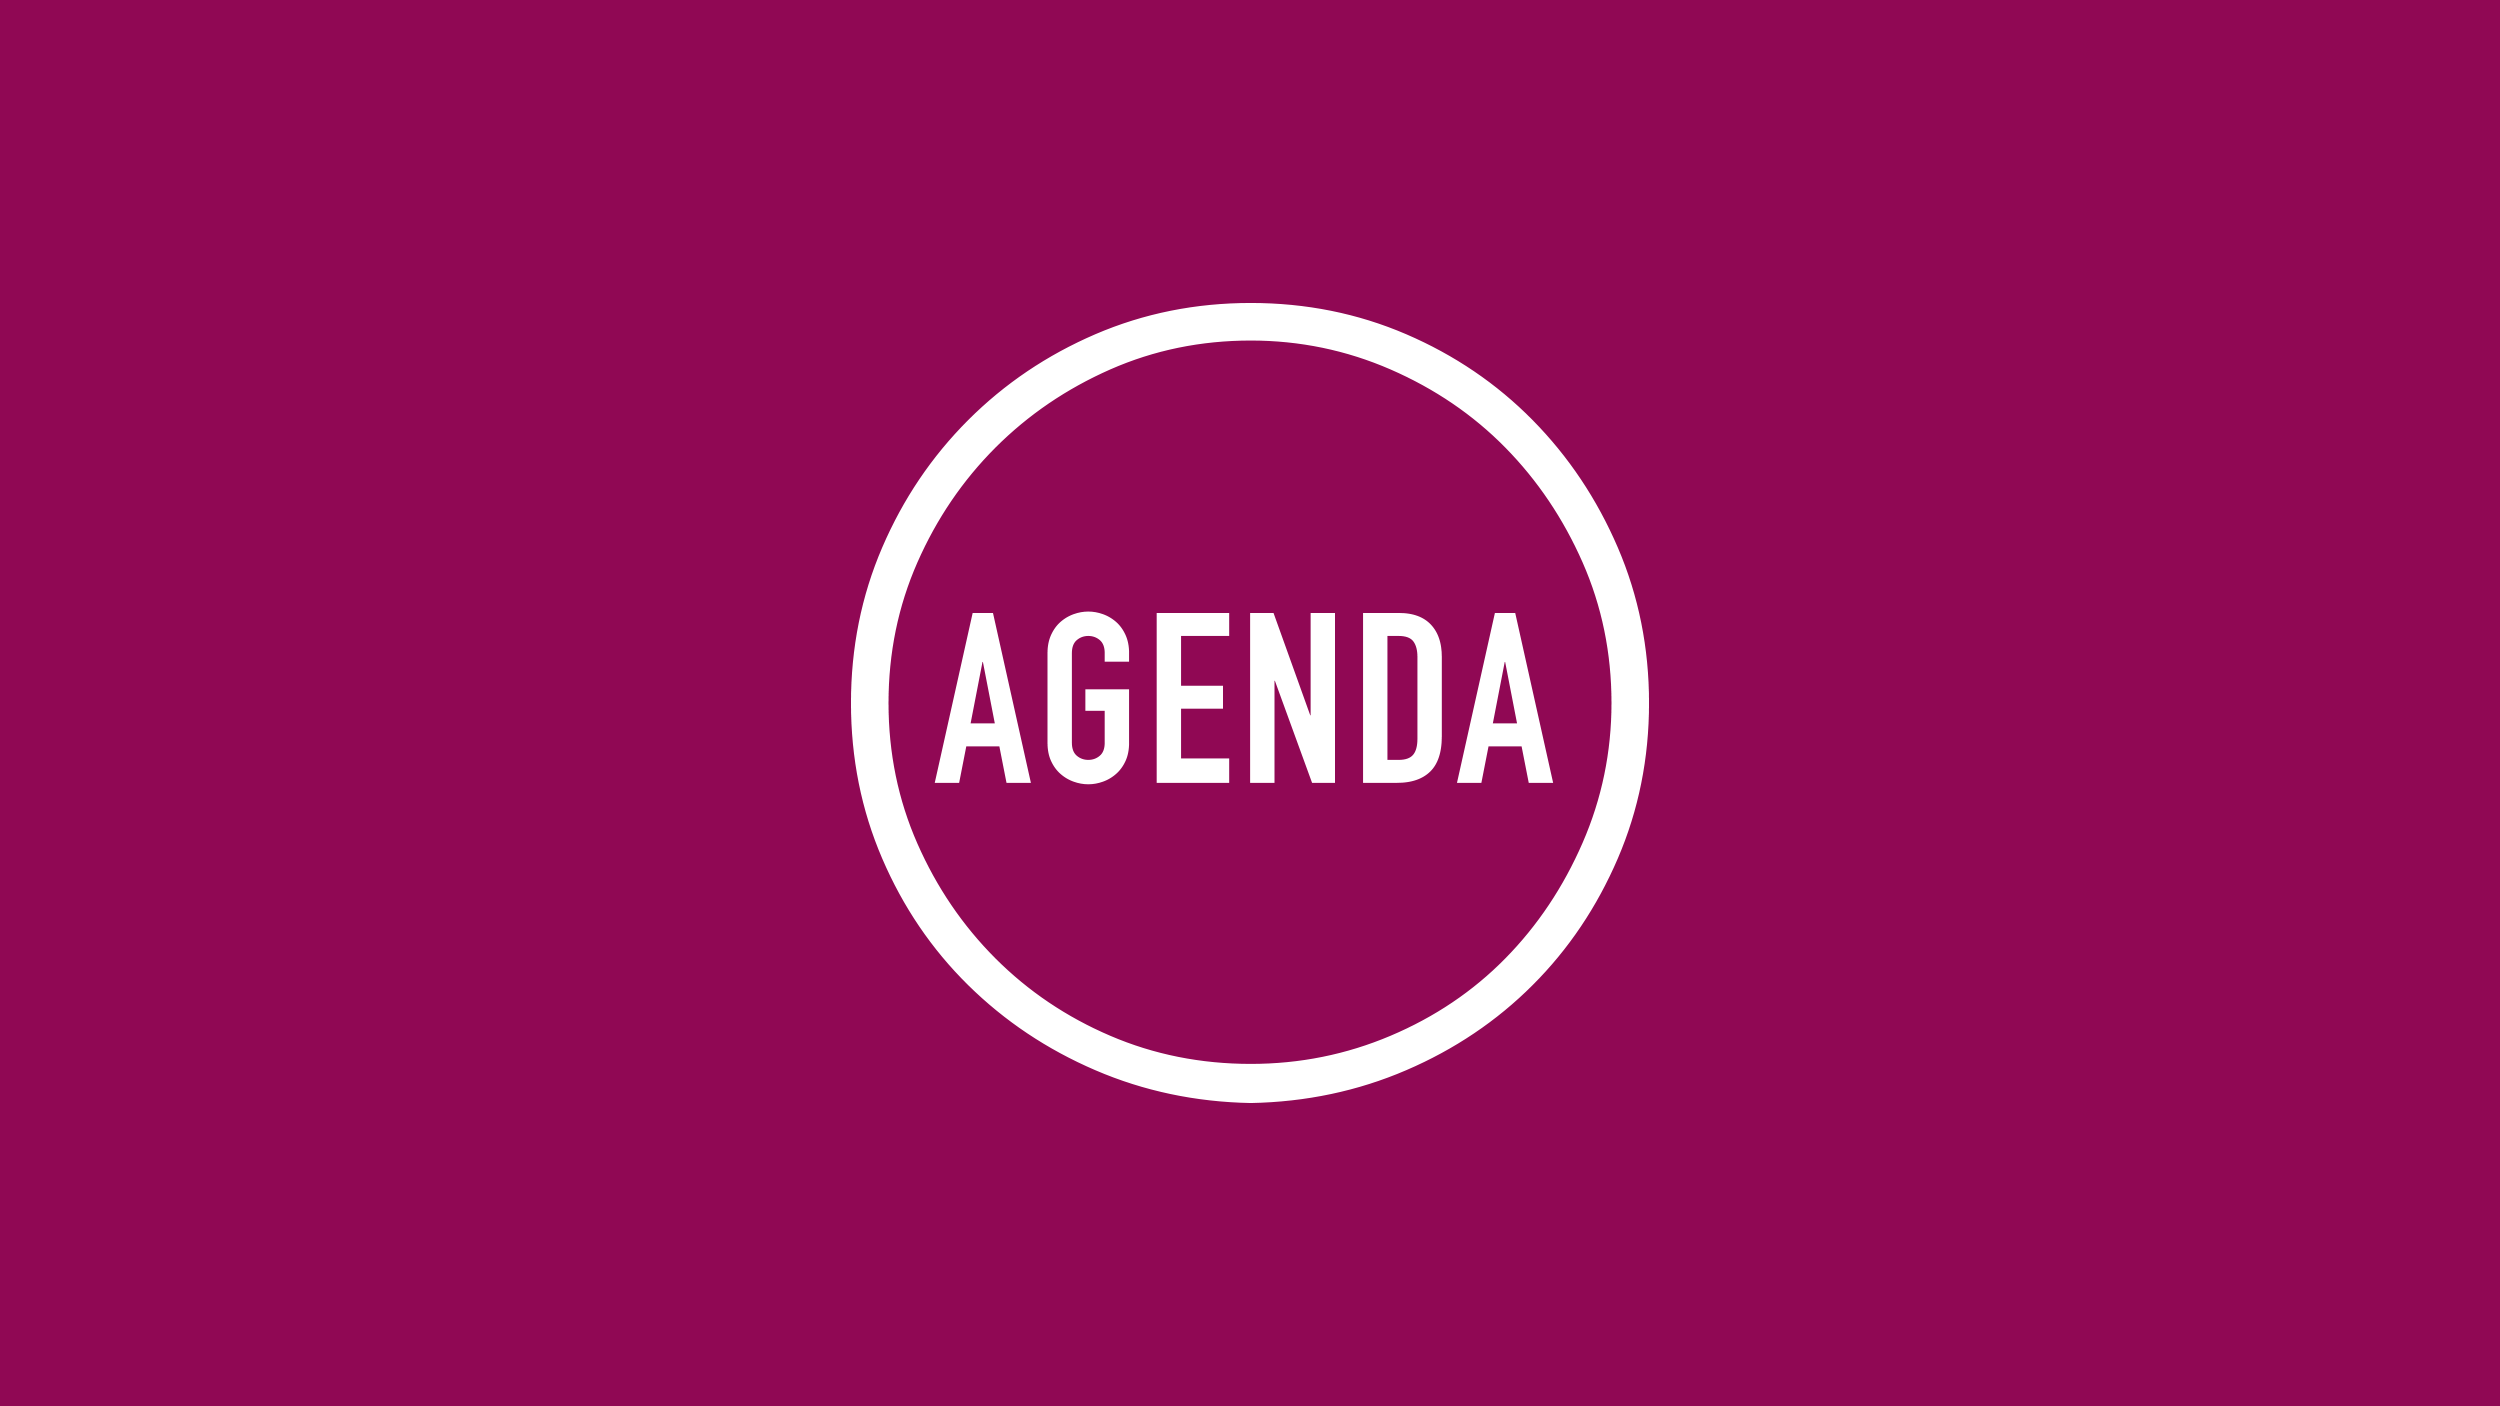 agendalogo.png